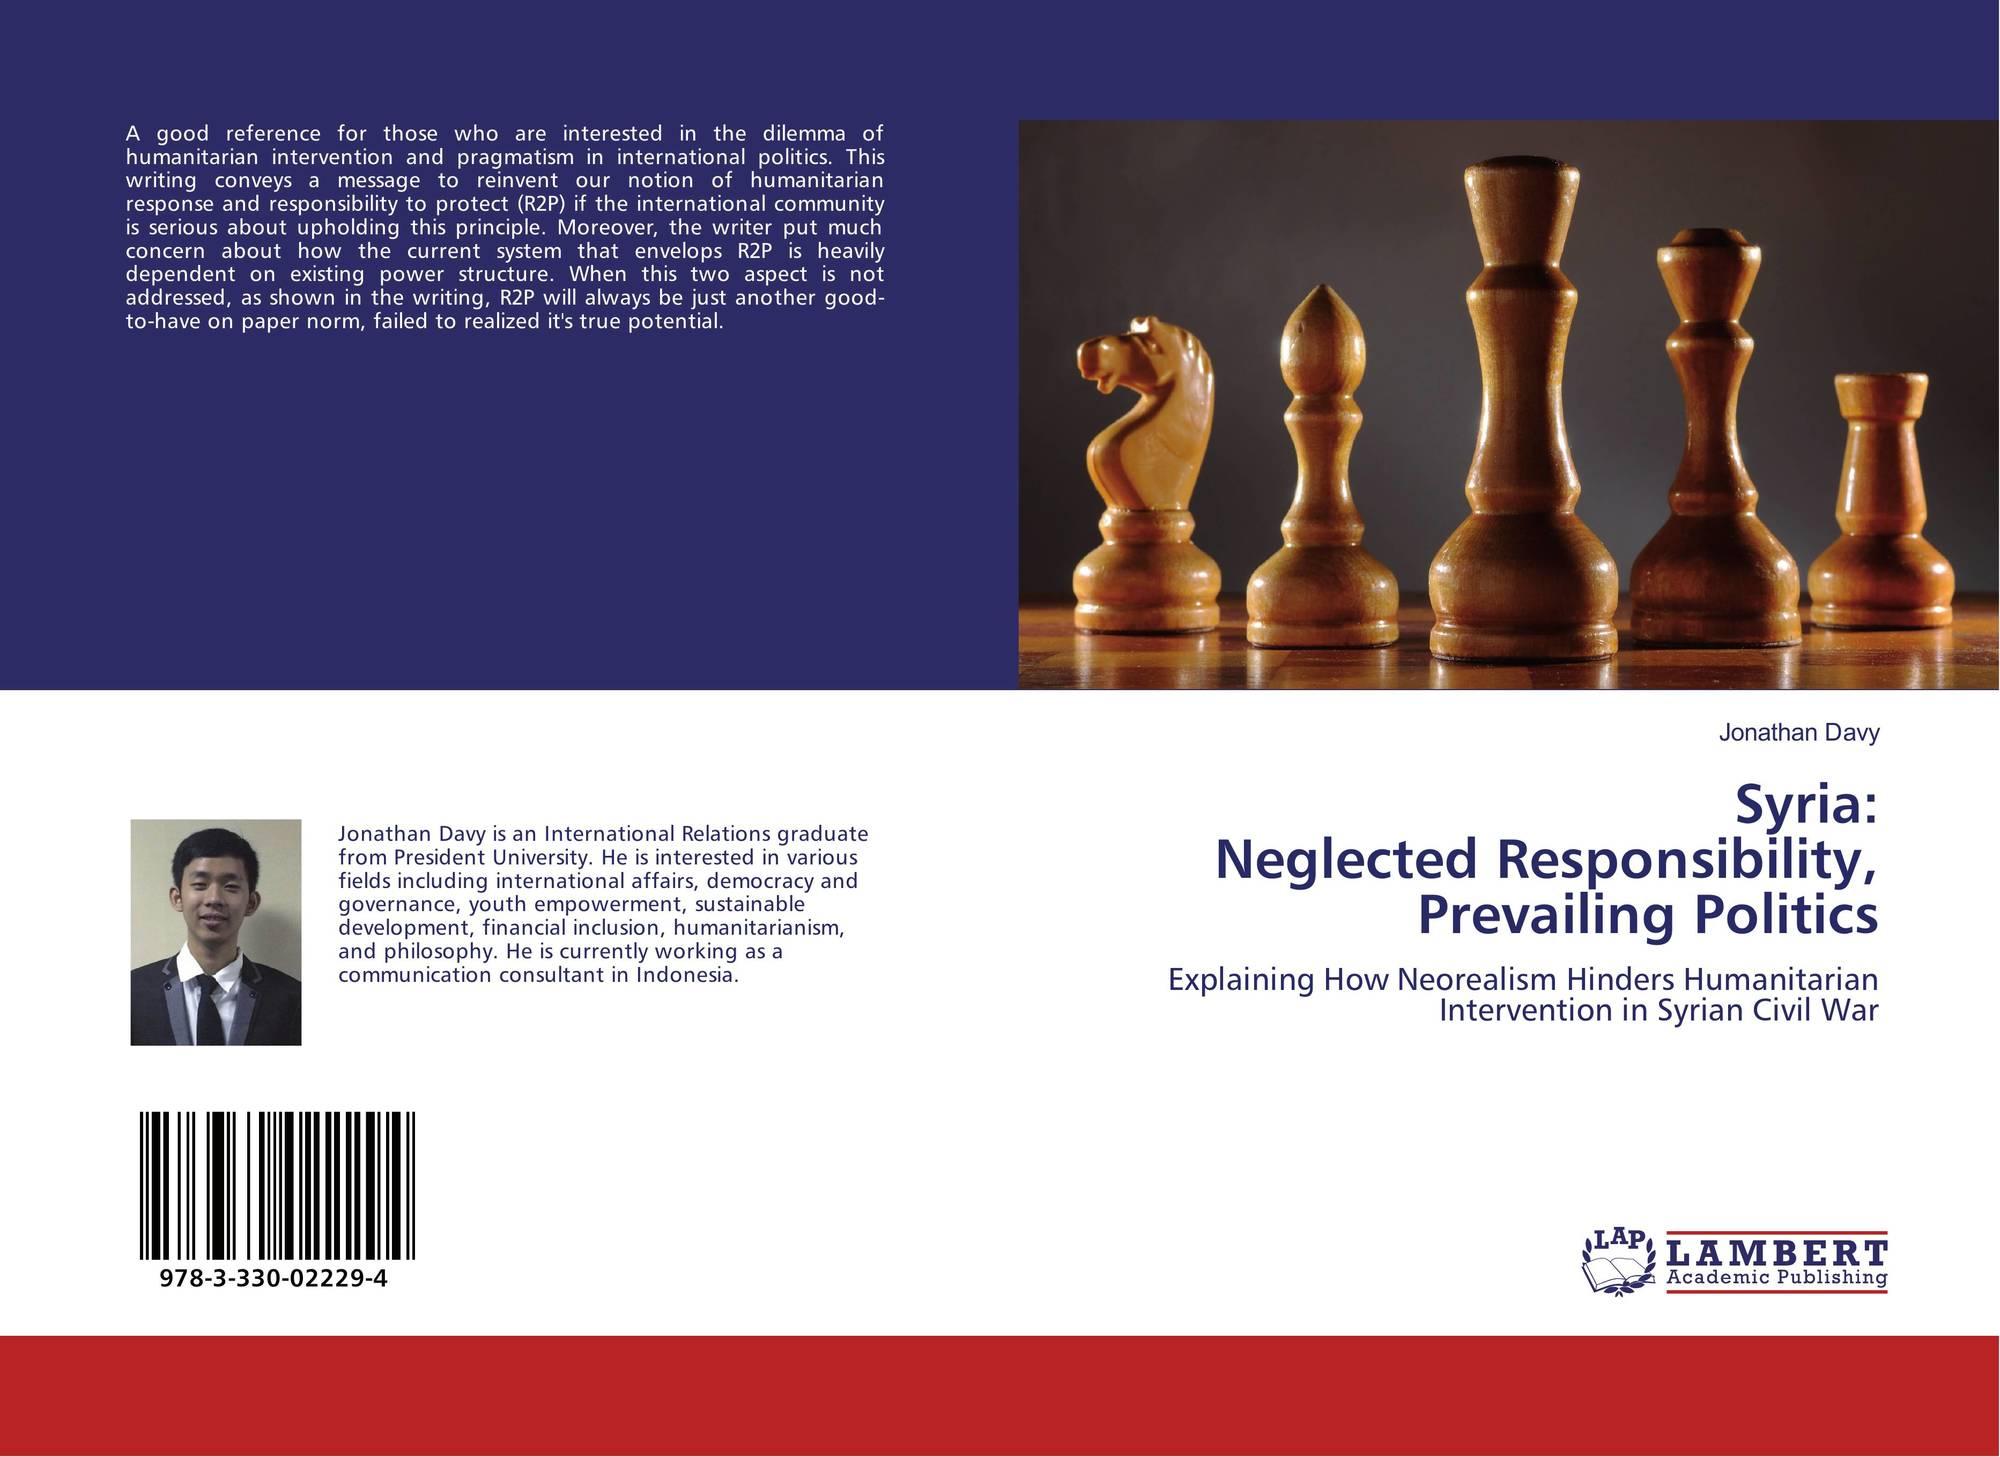 Syria: Neglected Responsibility, Prevailing Politics, 978-3-330